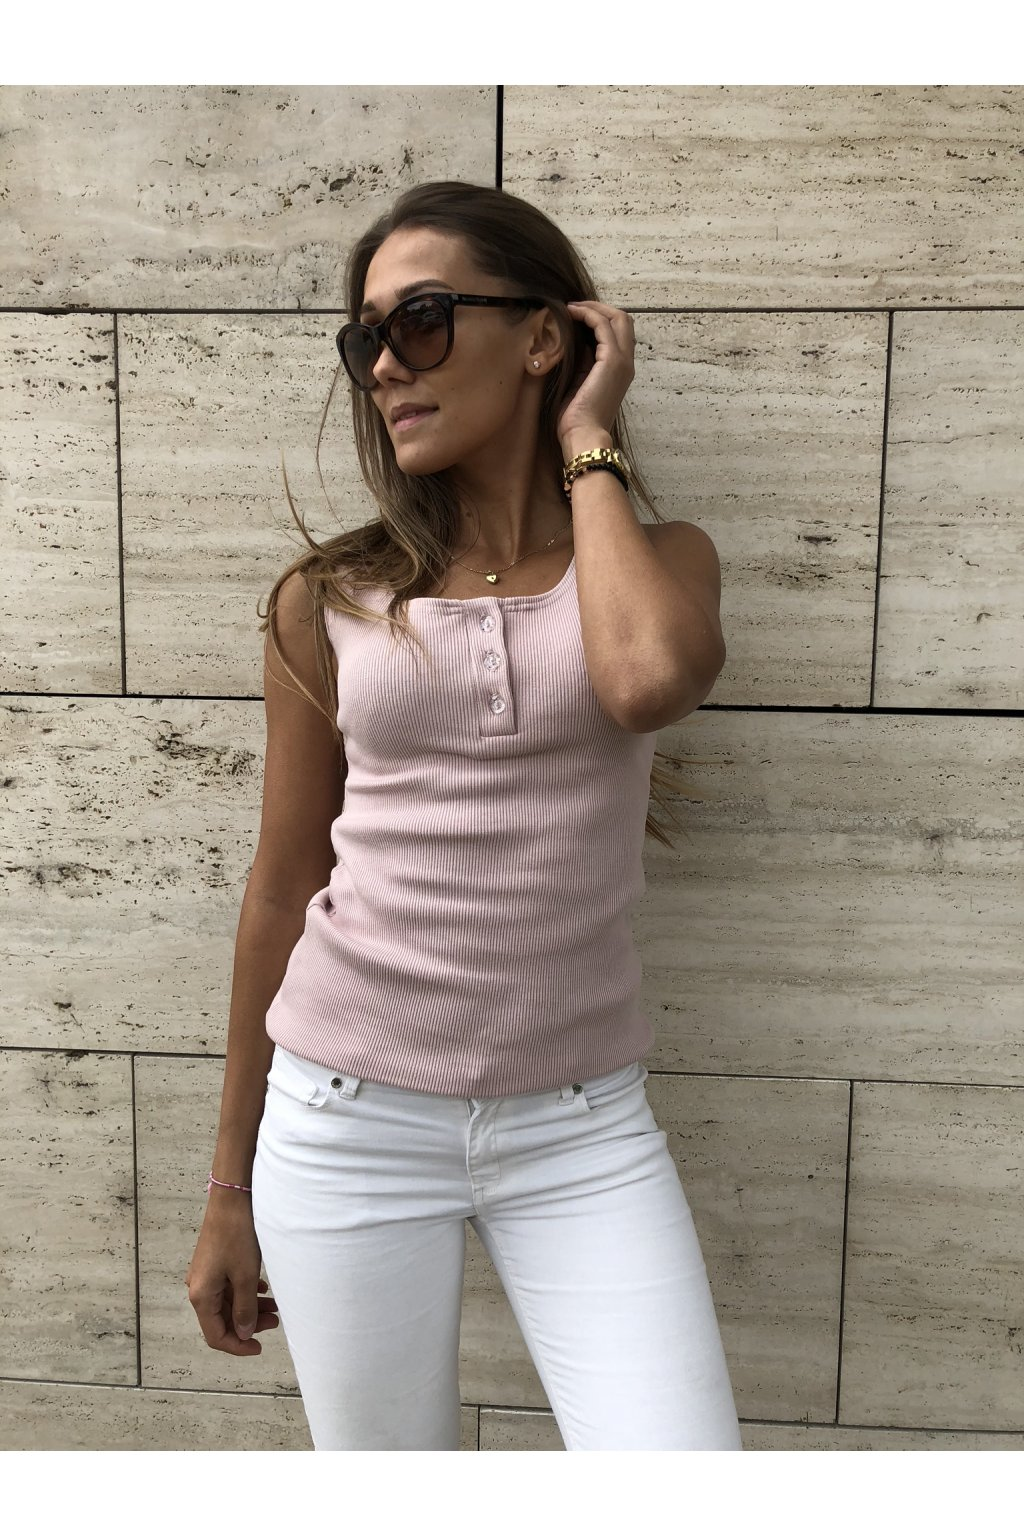 damske tilko classic light pink eshopat cz 1